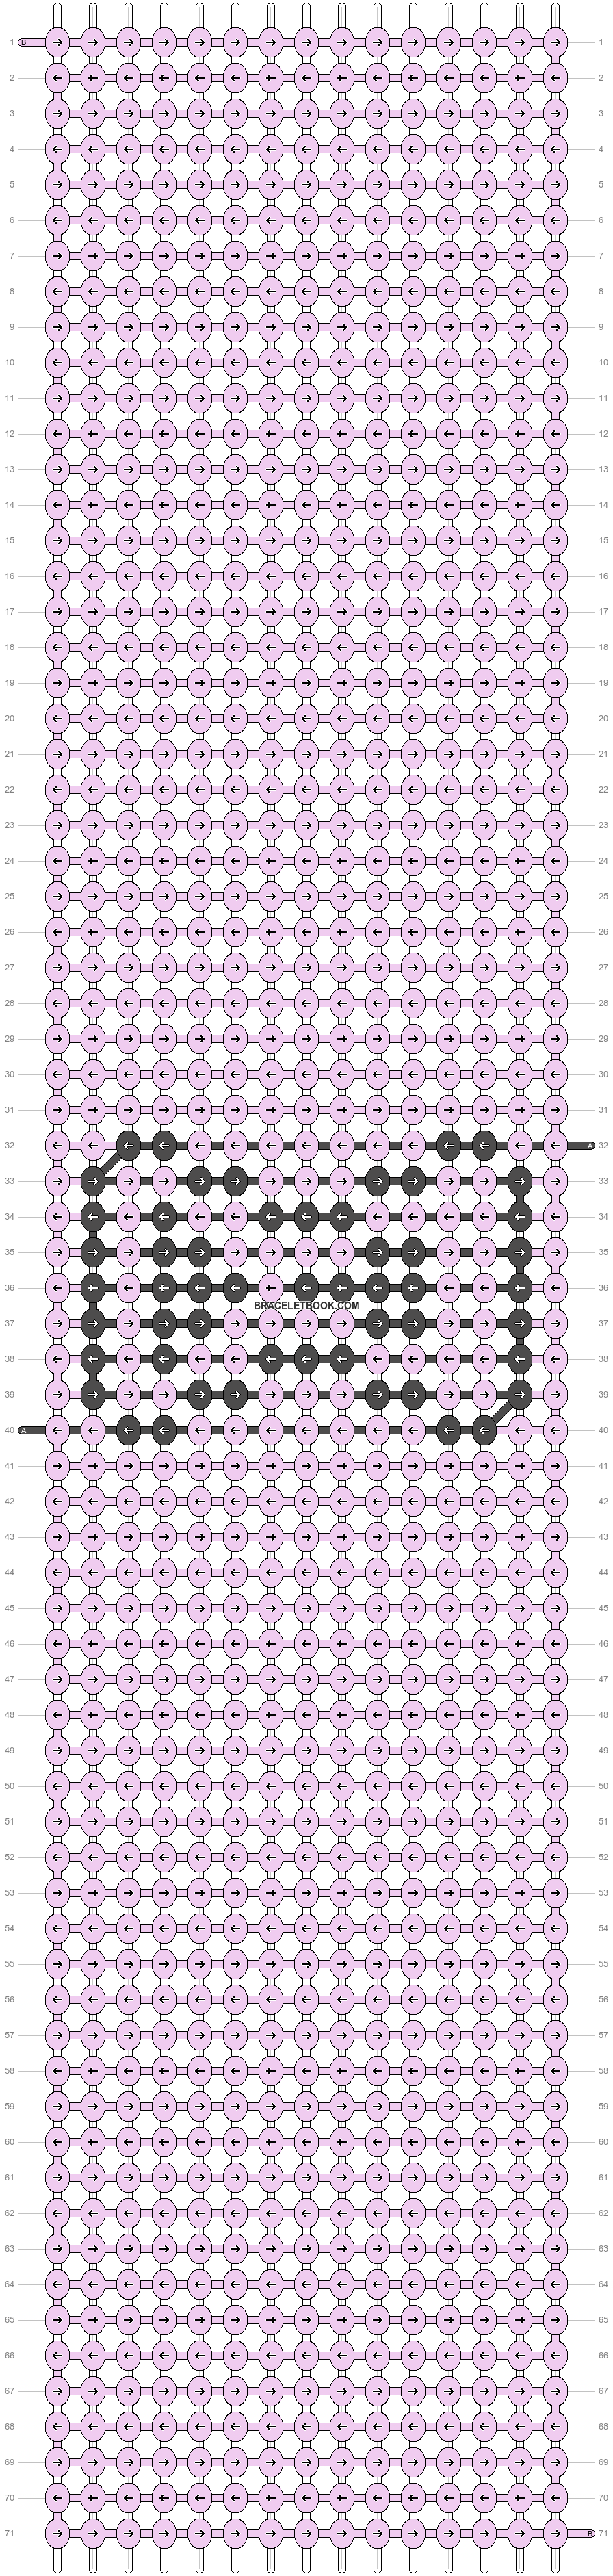 Alpha pattern #51467 pattern